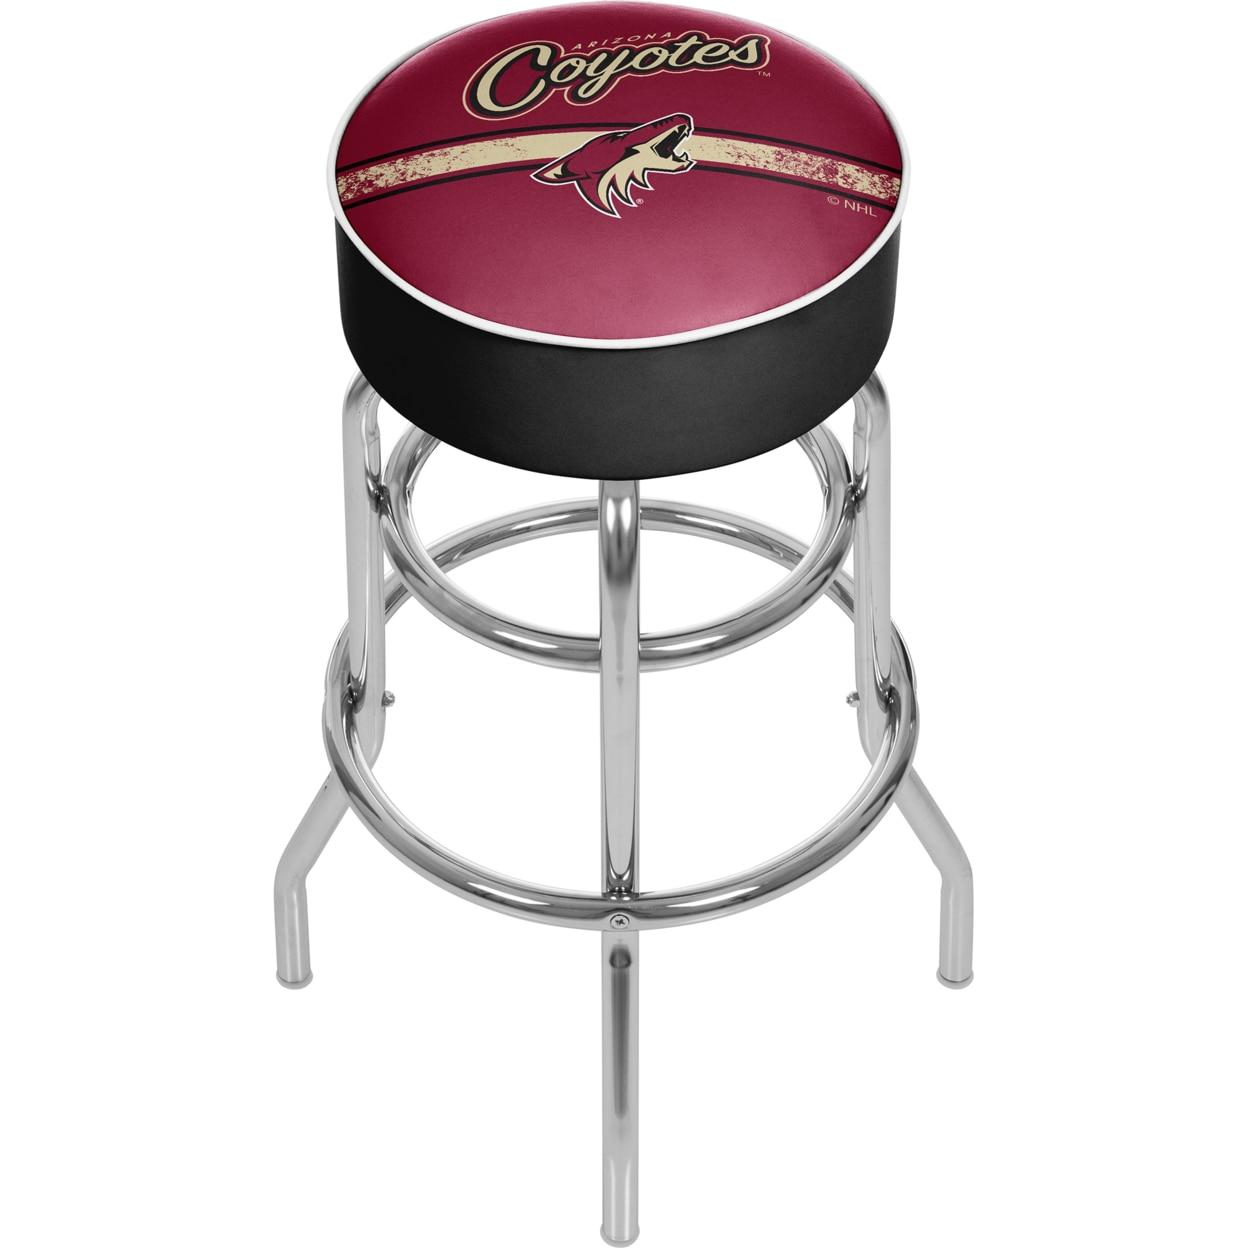 NHL Chrome 30 Inch Bar Stool with Swivel - Arizona Coyotes купить nhl 10 на xbox